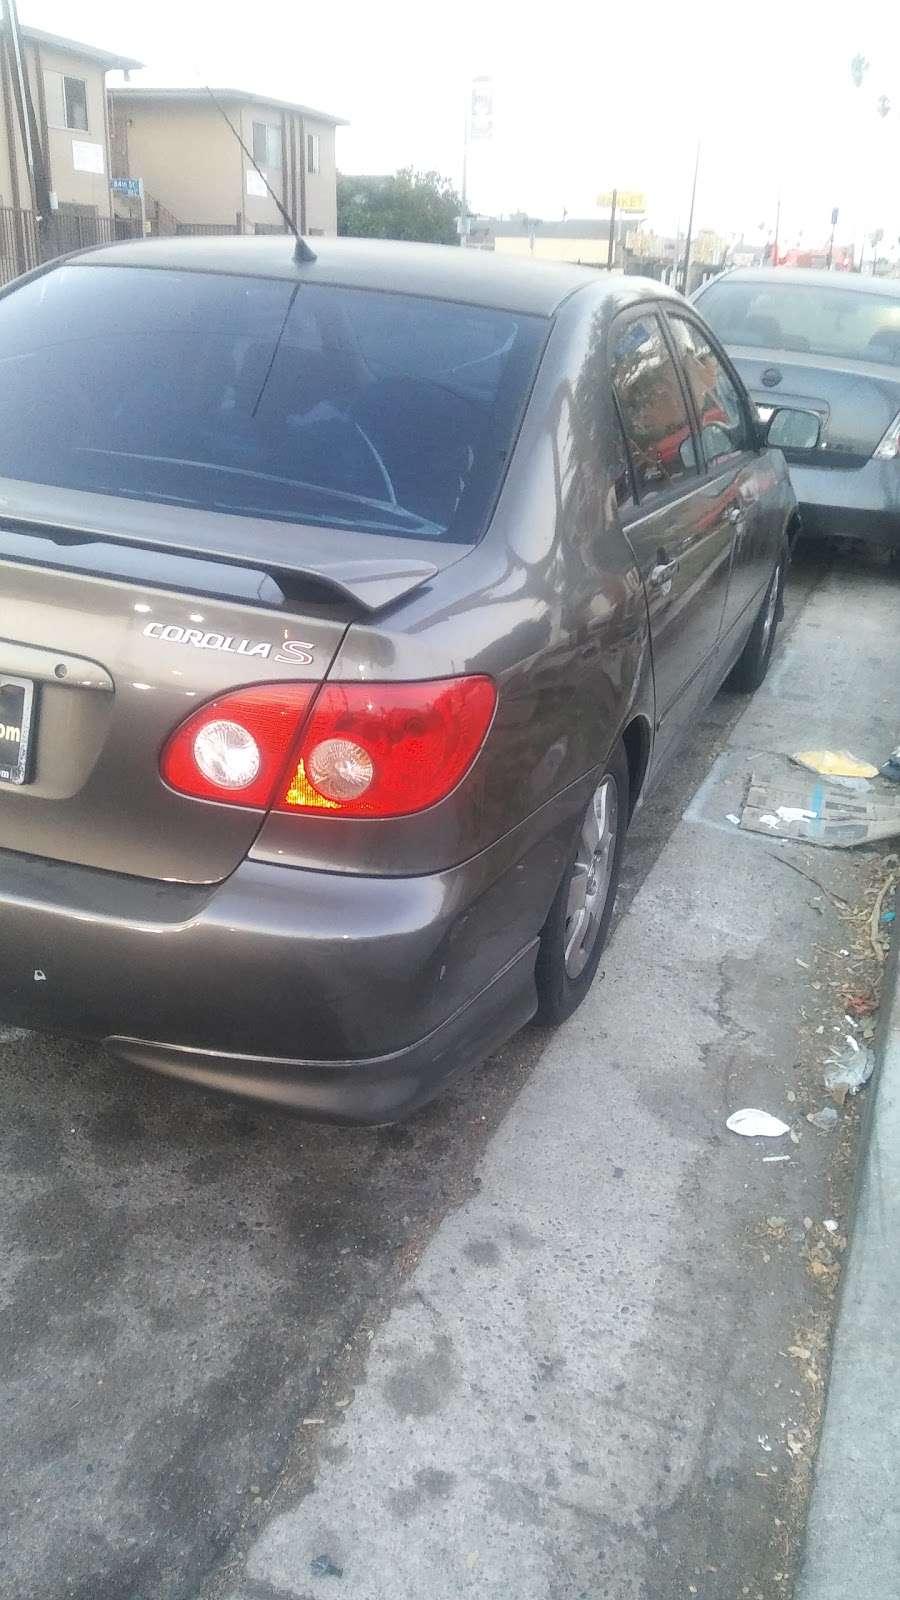 Leon Tires & Wheels - car repair  | Photo 8 of 10 | Address: 8431 S Main St, Los Angeles, CA 90003, USA | Phone: (323) 456-5405